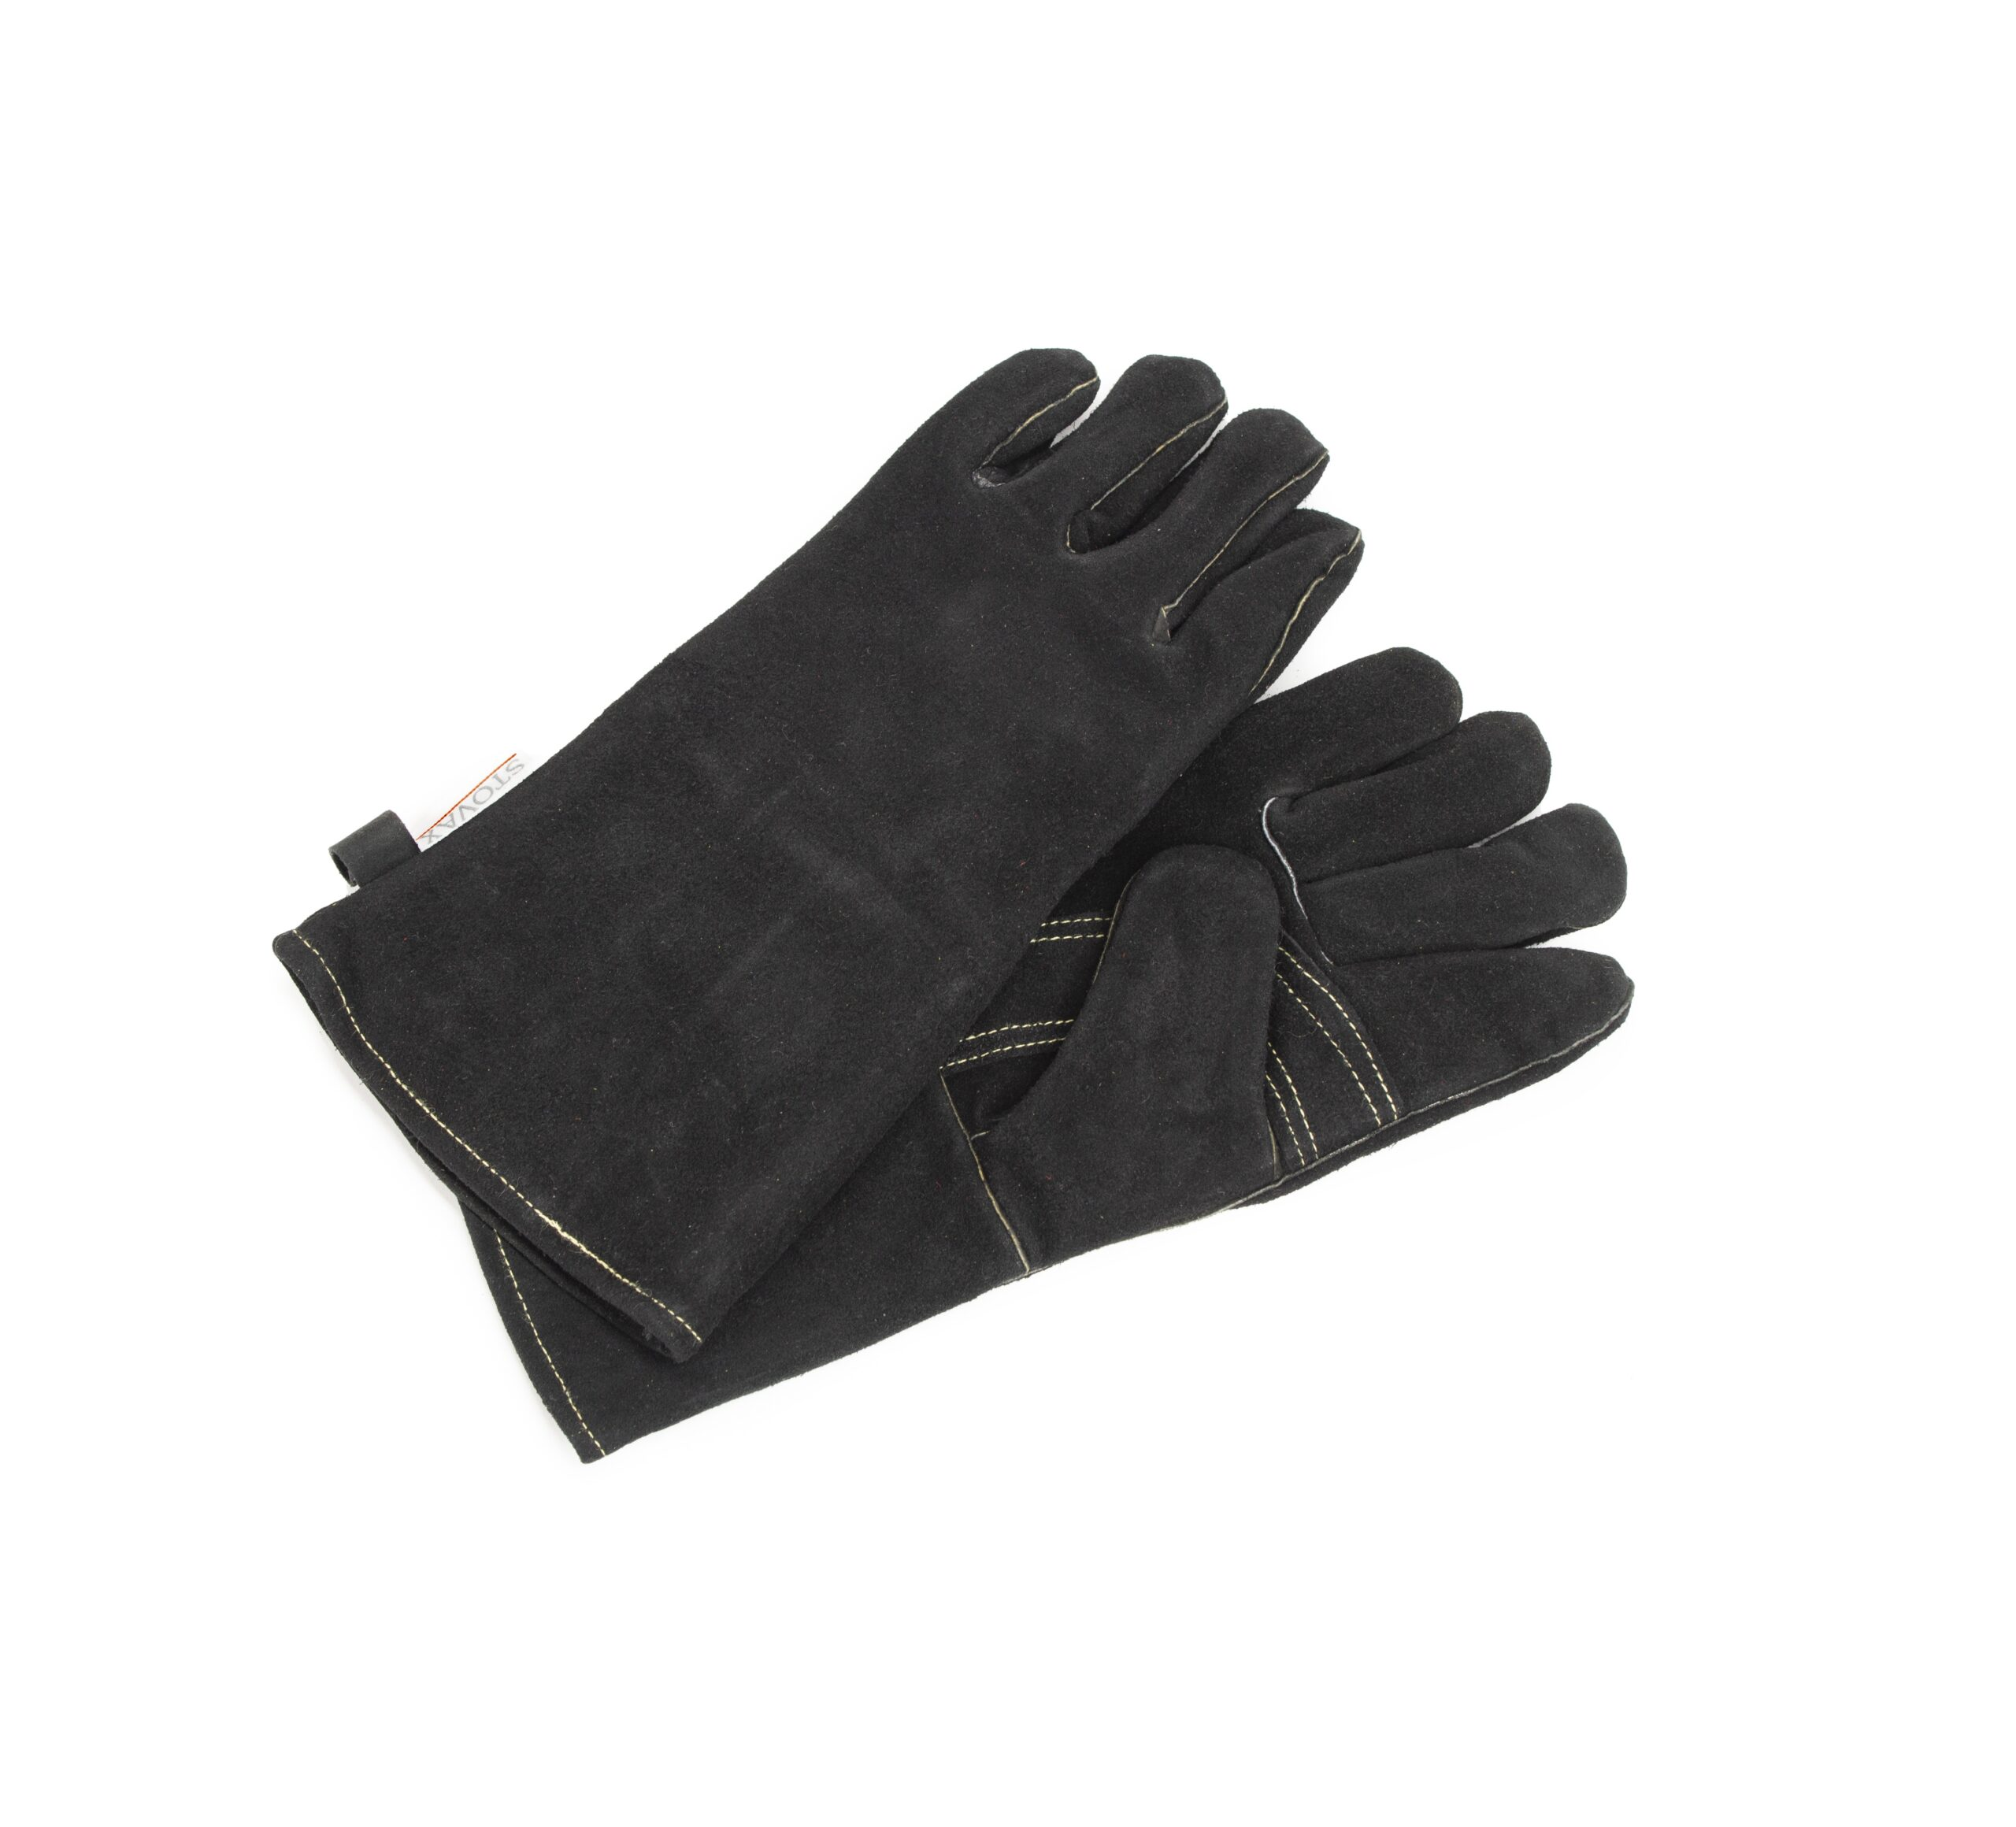 Stovax Stove Gloves (pair)